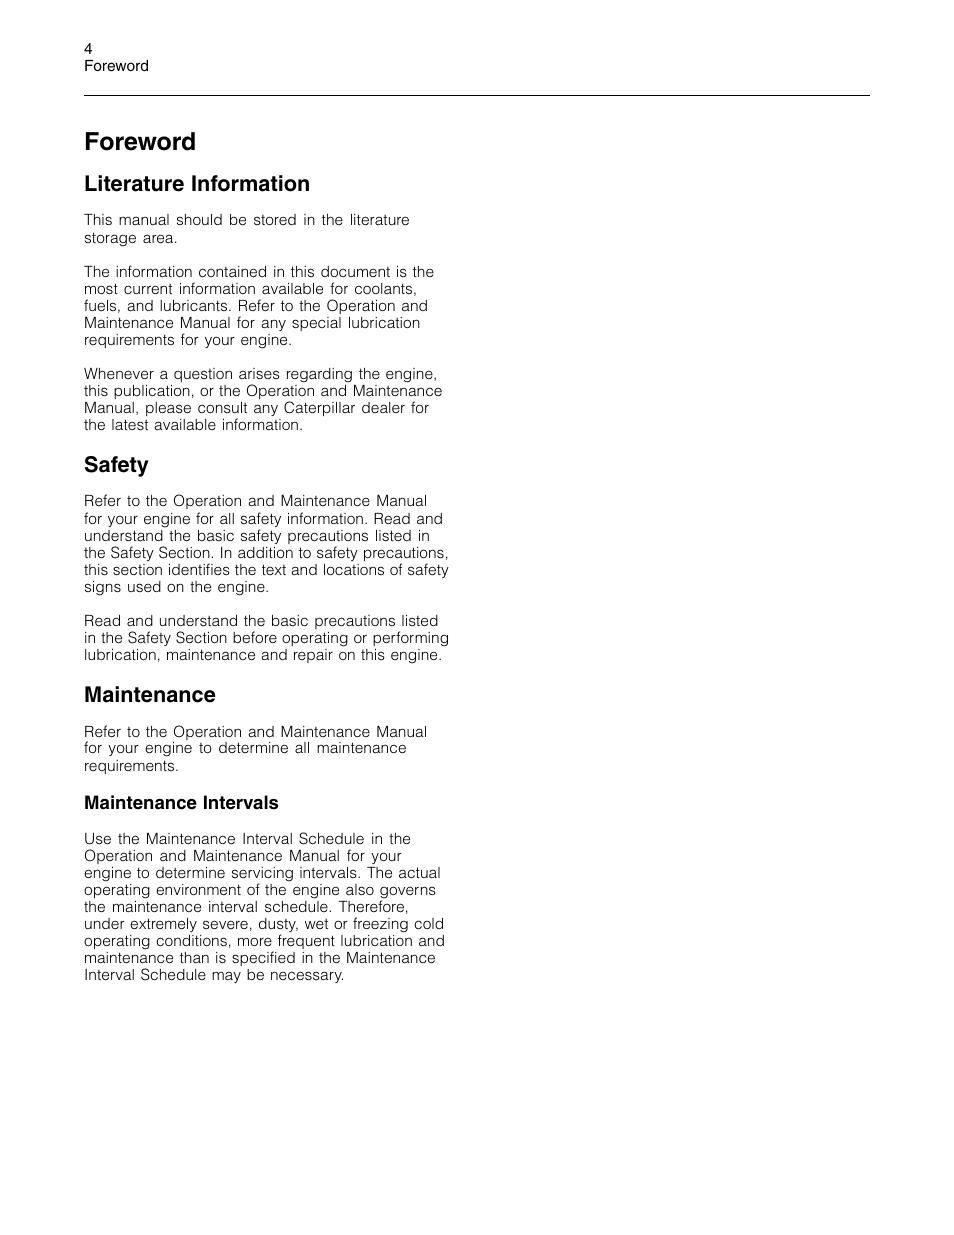 Foreword, Literature information, Safety | Maintenance | 3Com Caterpillar  Commercial Diesel Engine SEBU6251-